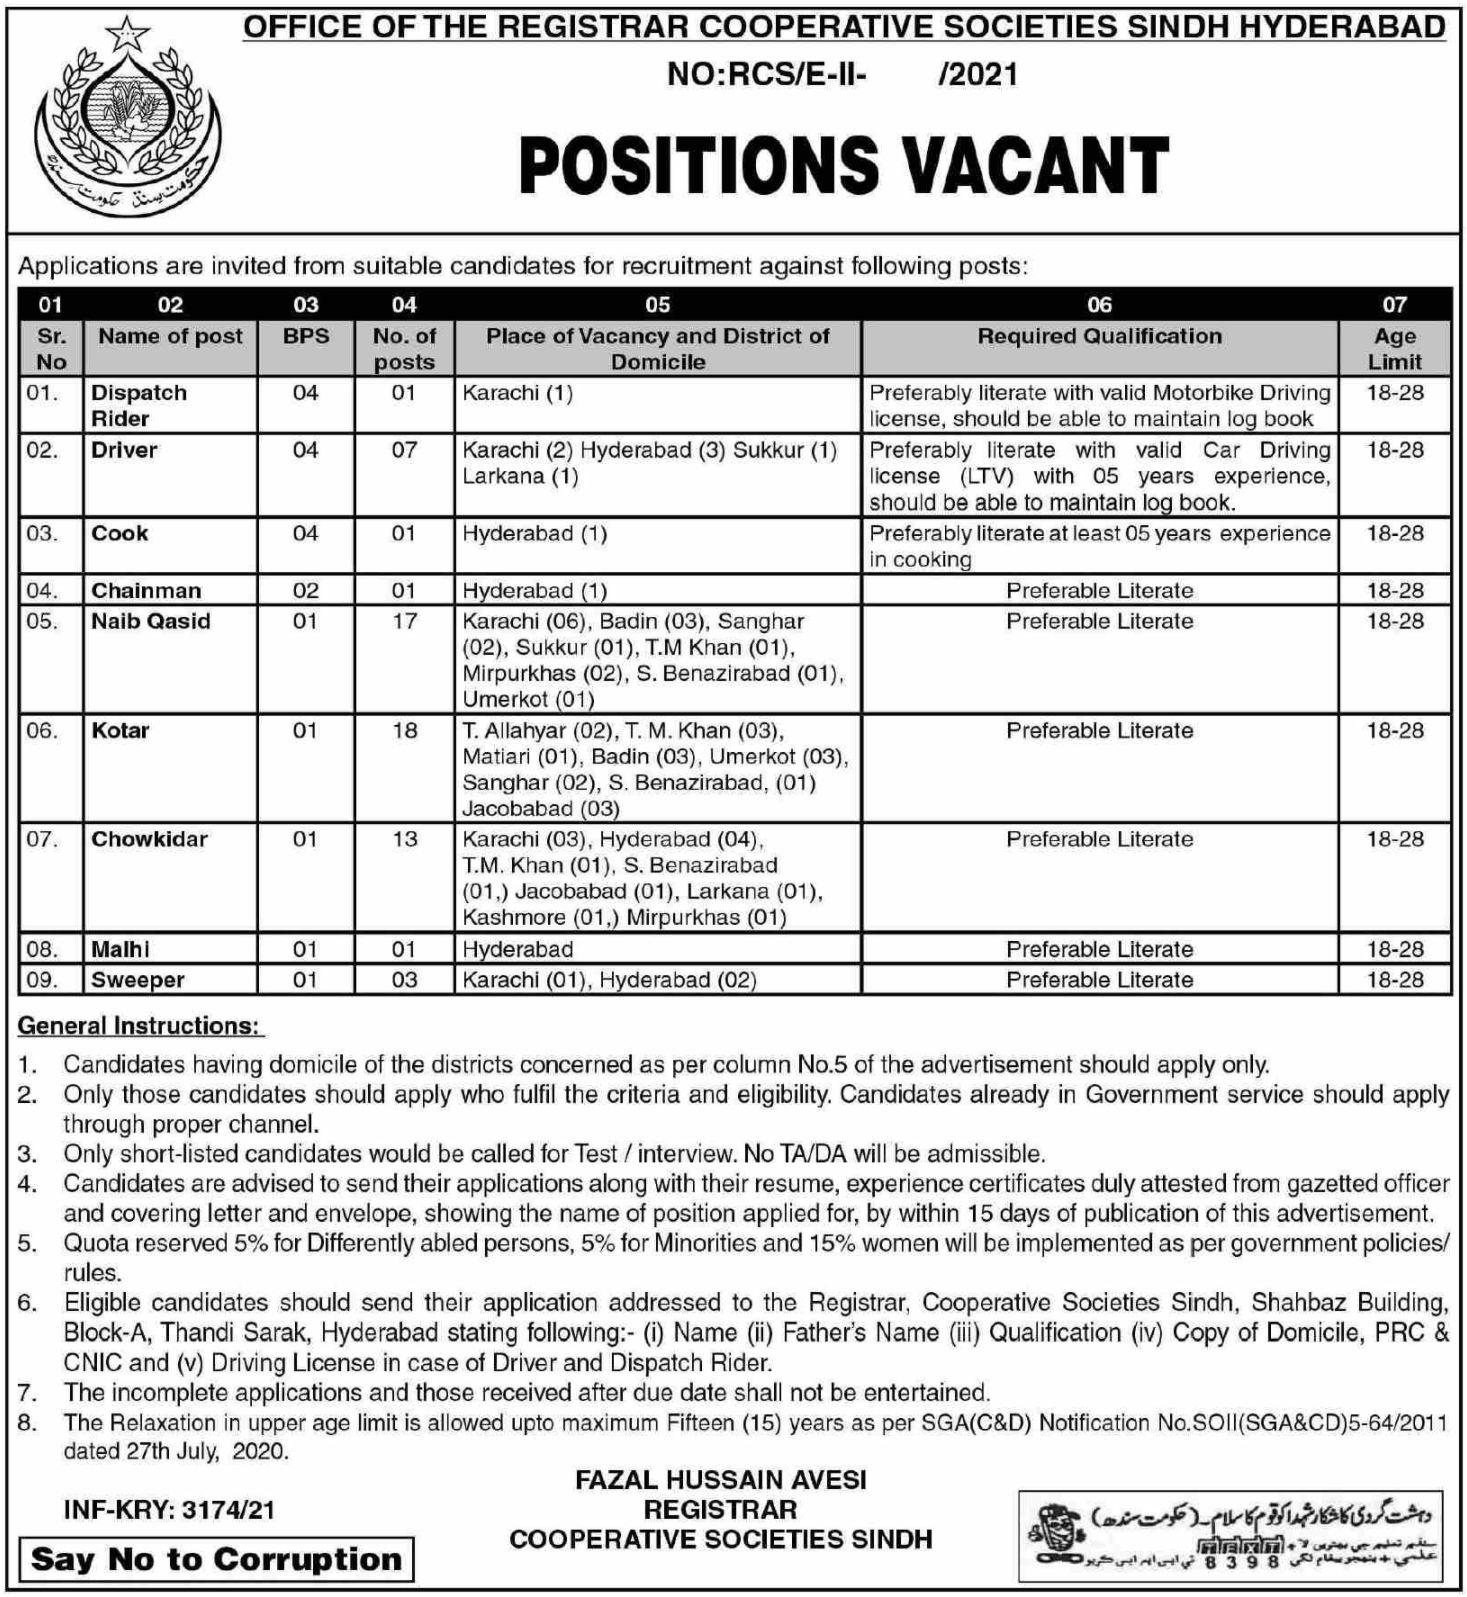 Cooperative Societies Sindh Vacancies 2021 Dailyjobs.pk 3